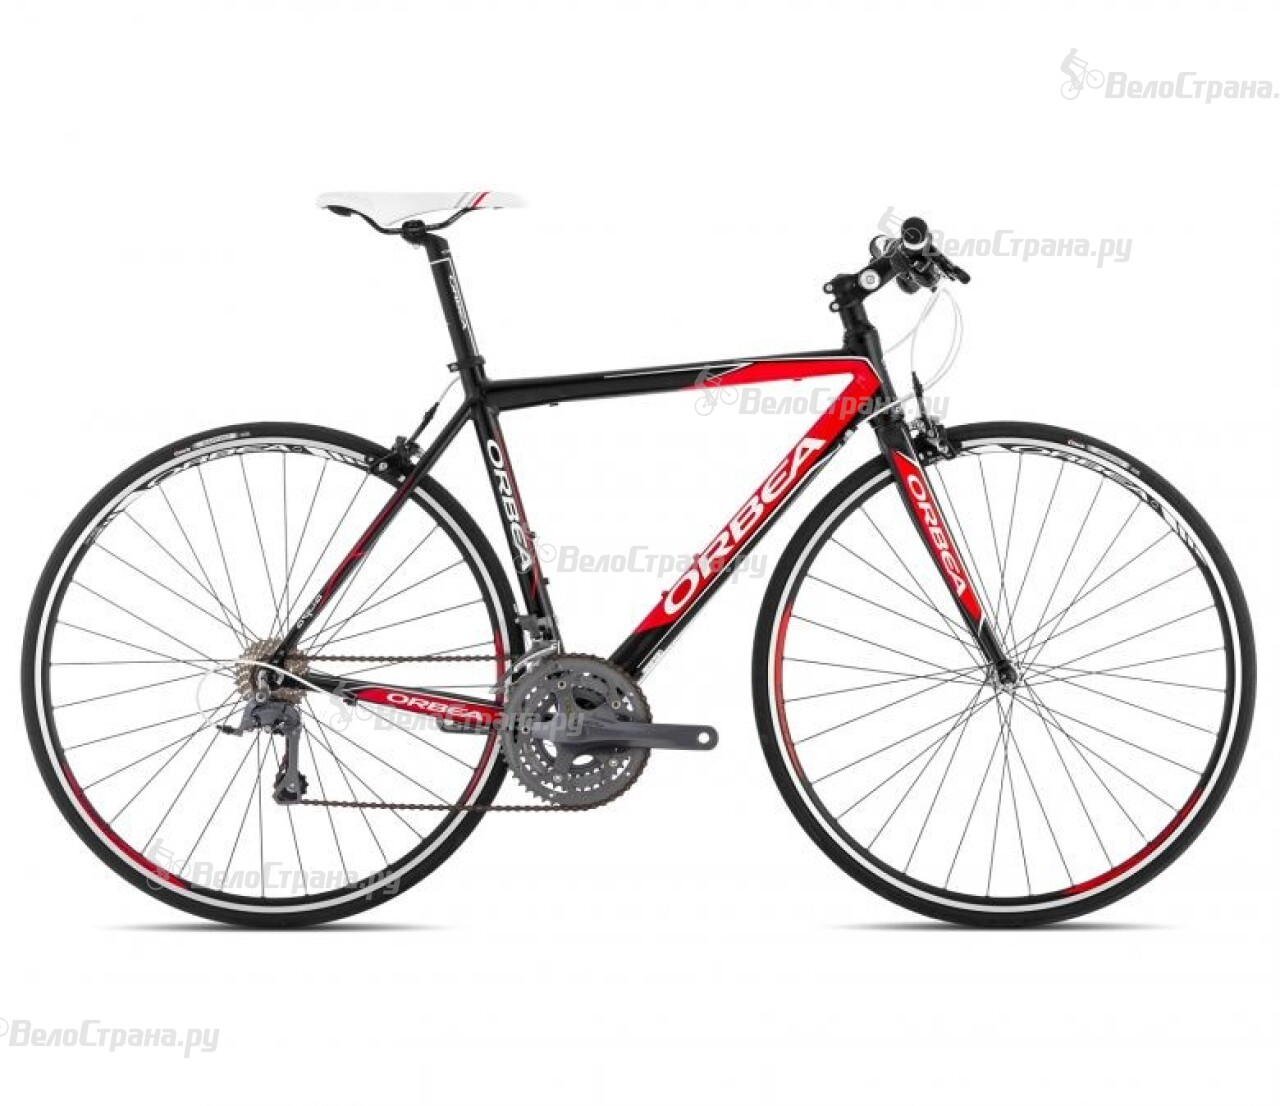 Велосипед Orbea Aqua 50 Flat (2014) велосипед wheeler protron 50 2014